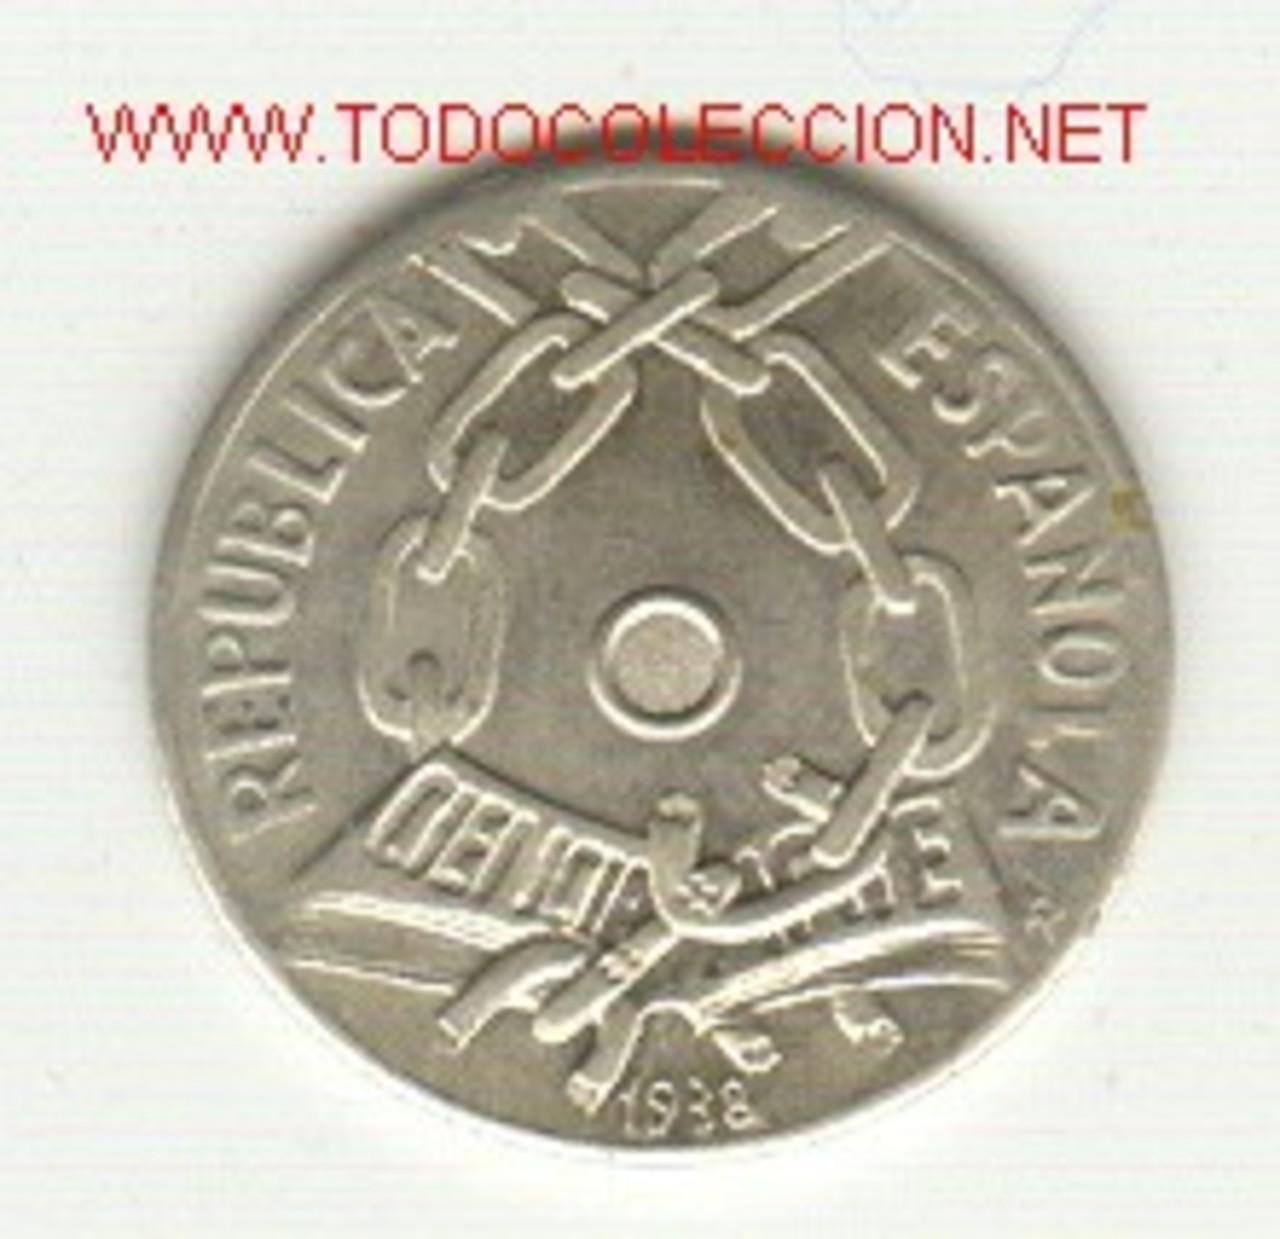 Duro de Carlos IV con reverso de 5 francos franceses Fantasia_a